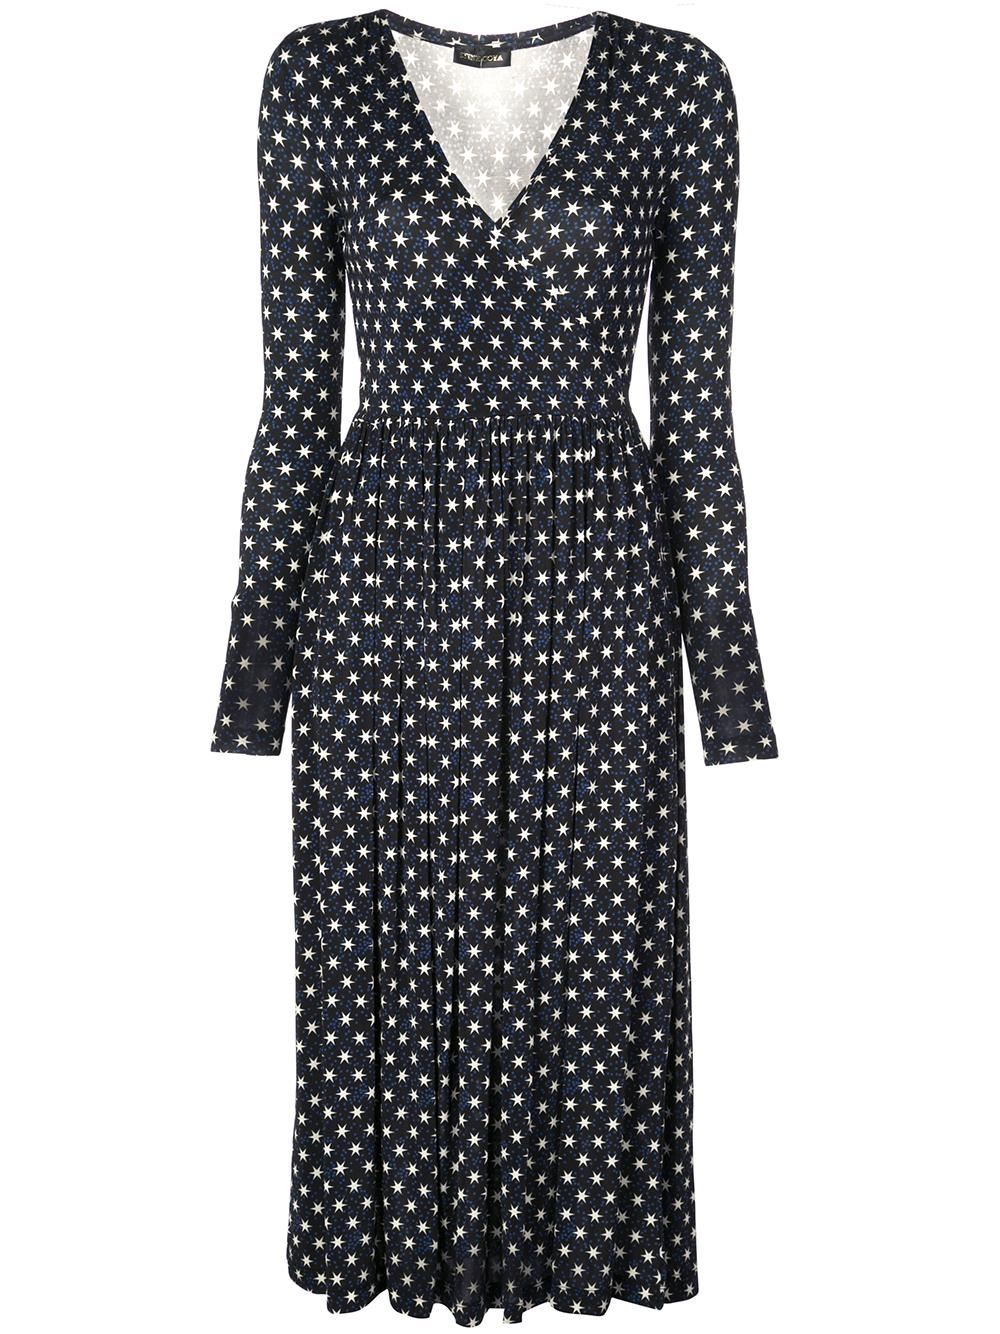 Aline Light Jersey Star Print Dress Item # SG2581